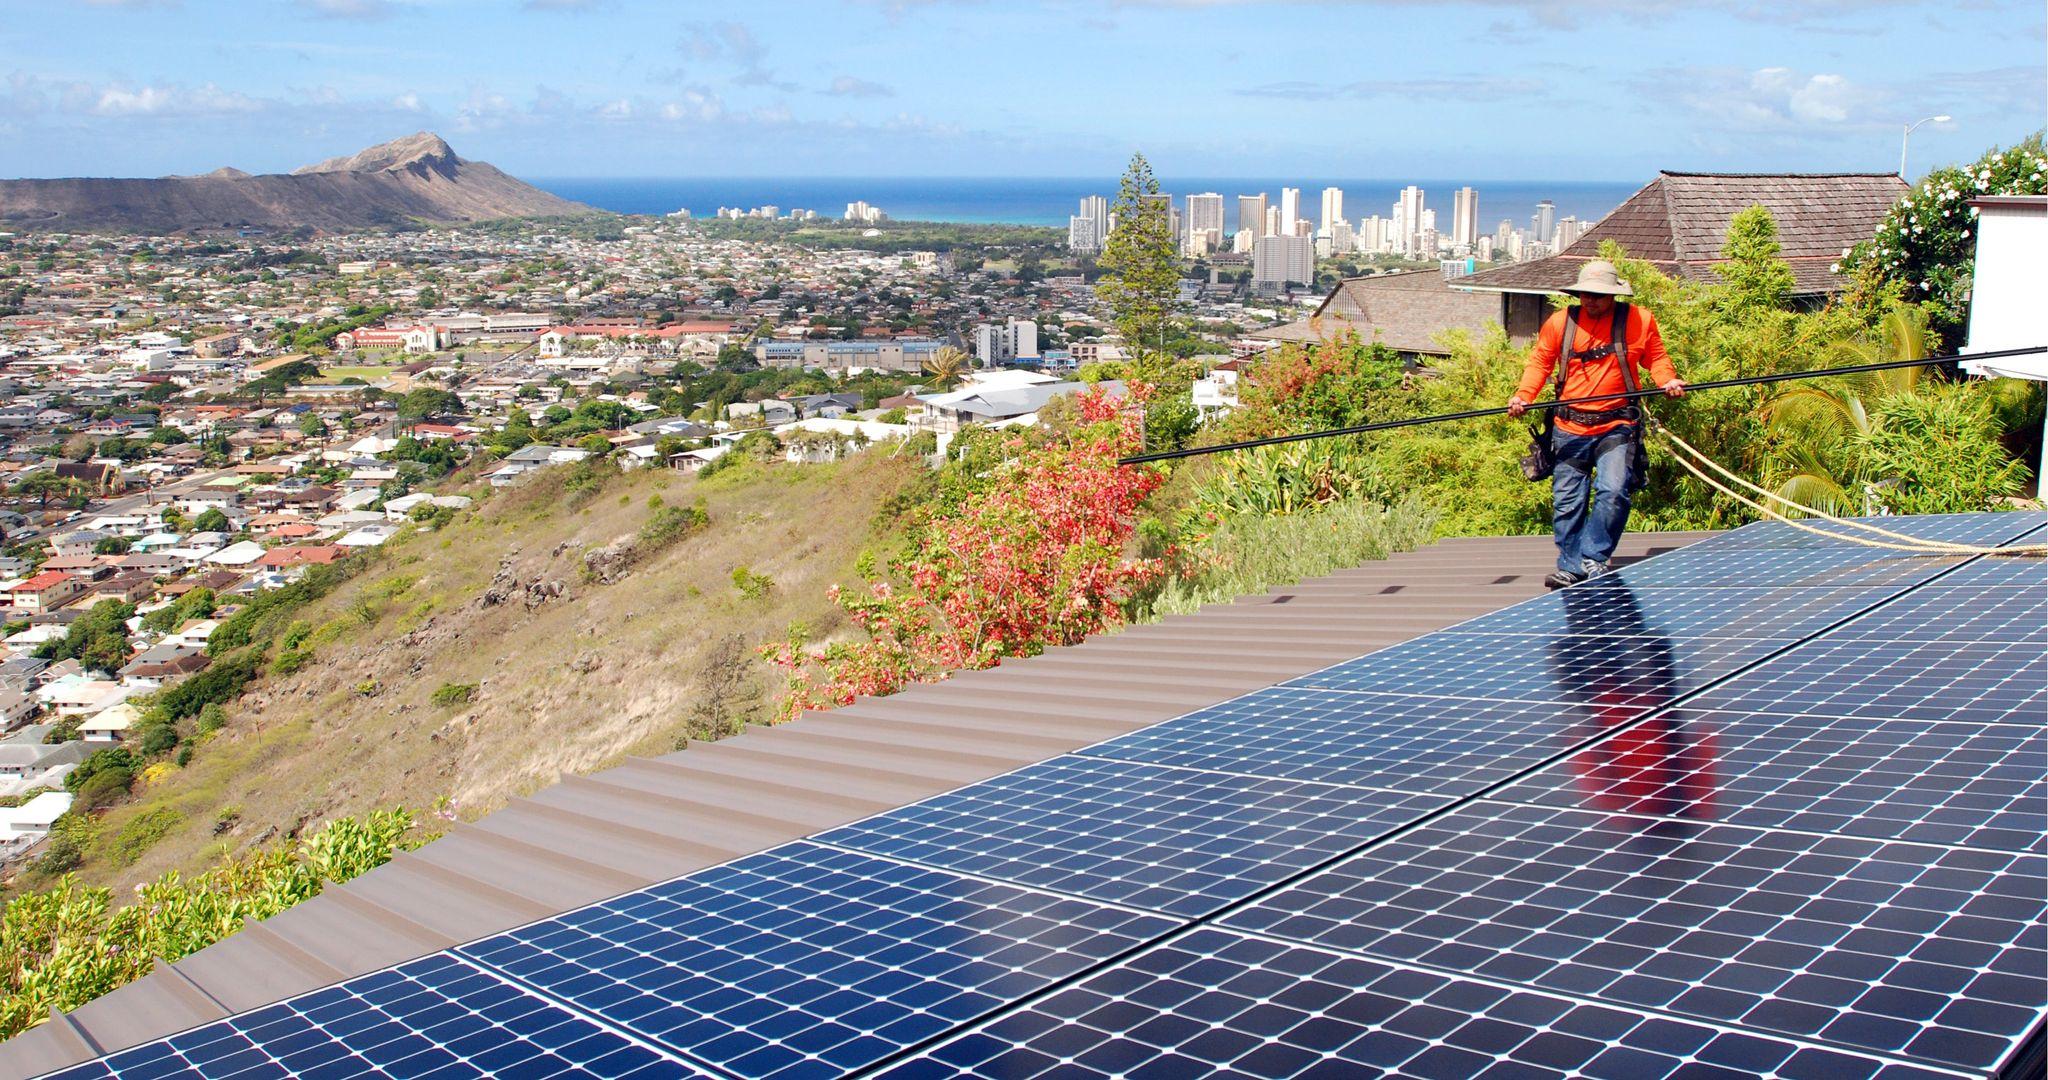 Solar energy capacity, usage more than 'sun coast' experience